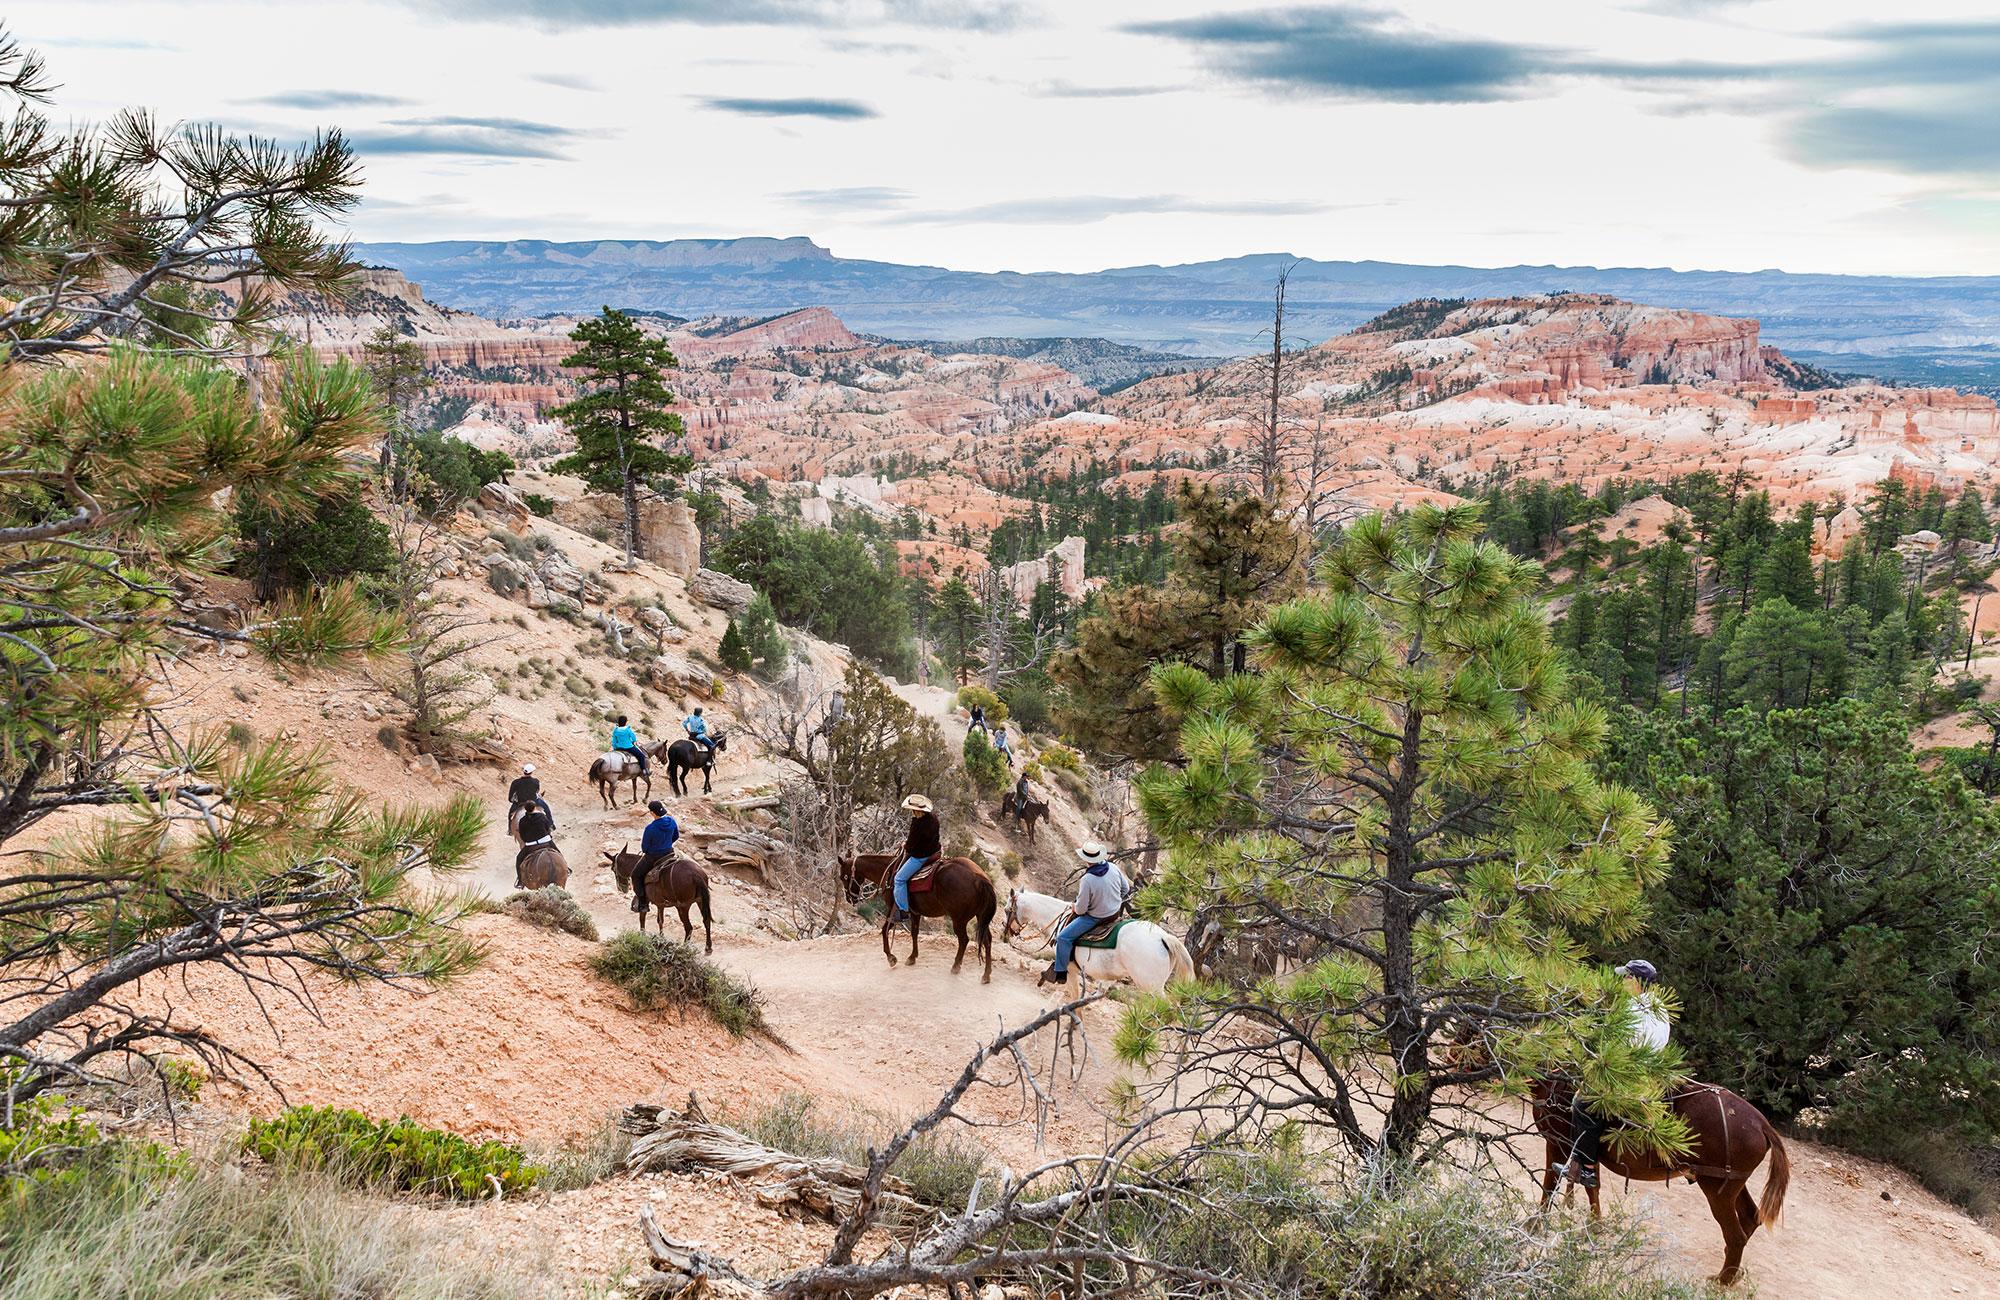 Voyage Ouest américain - balade à cheval Bryce Canyon - Amplitudes